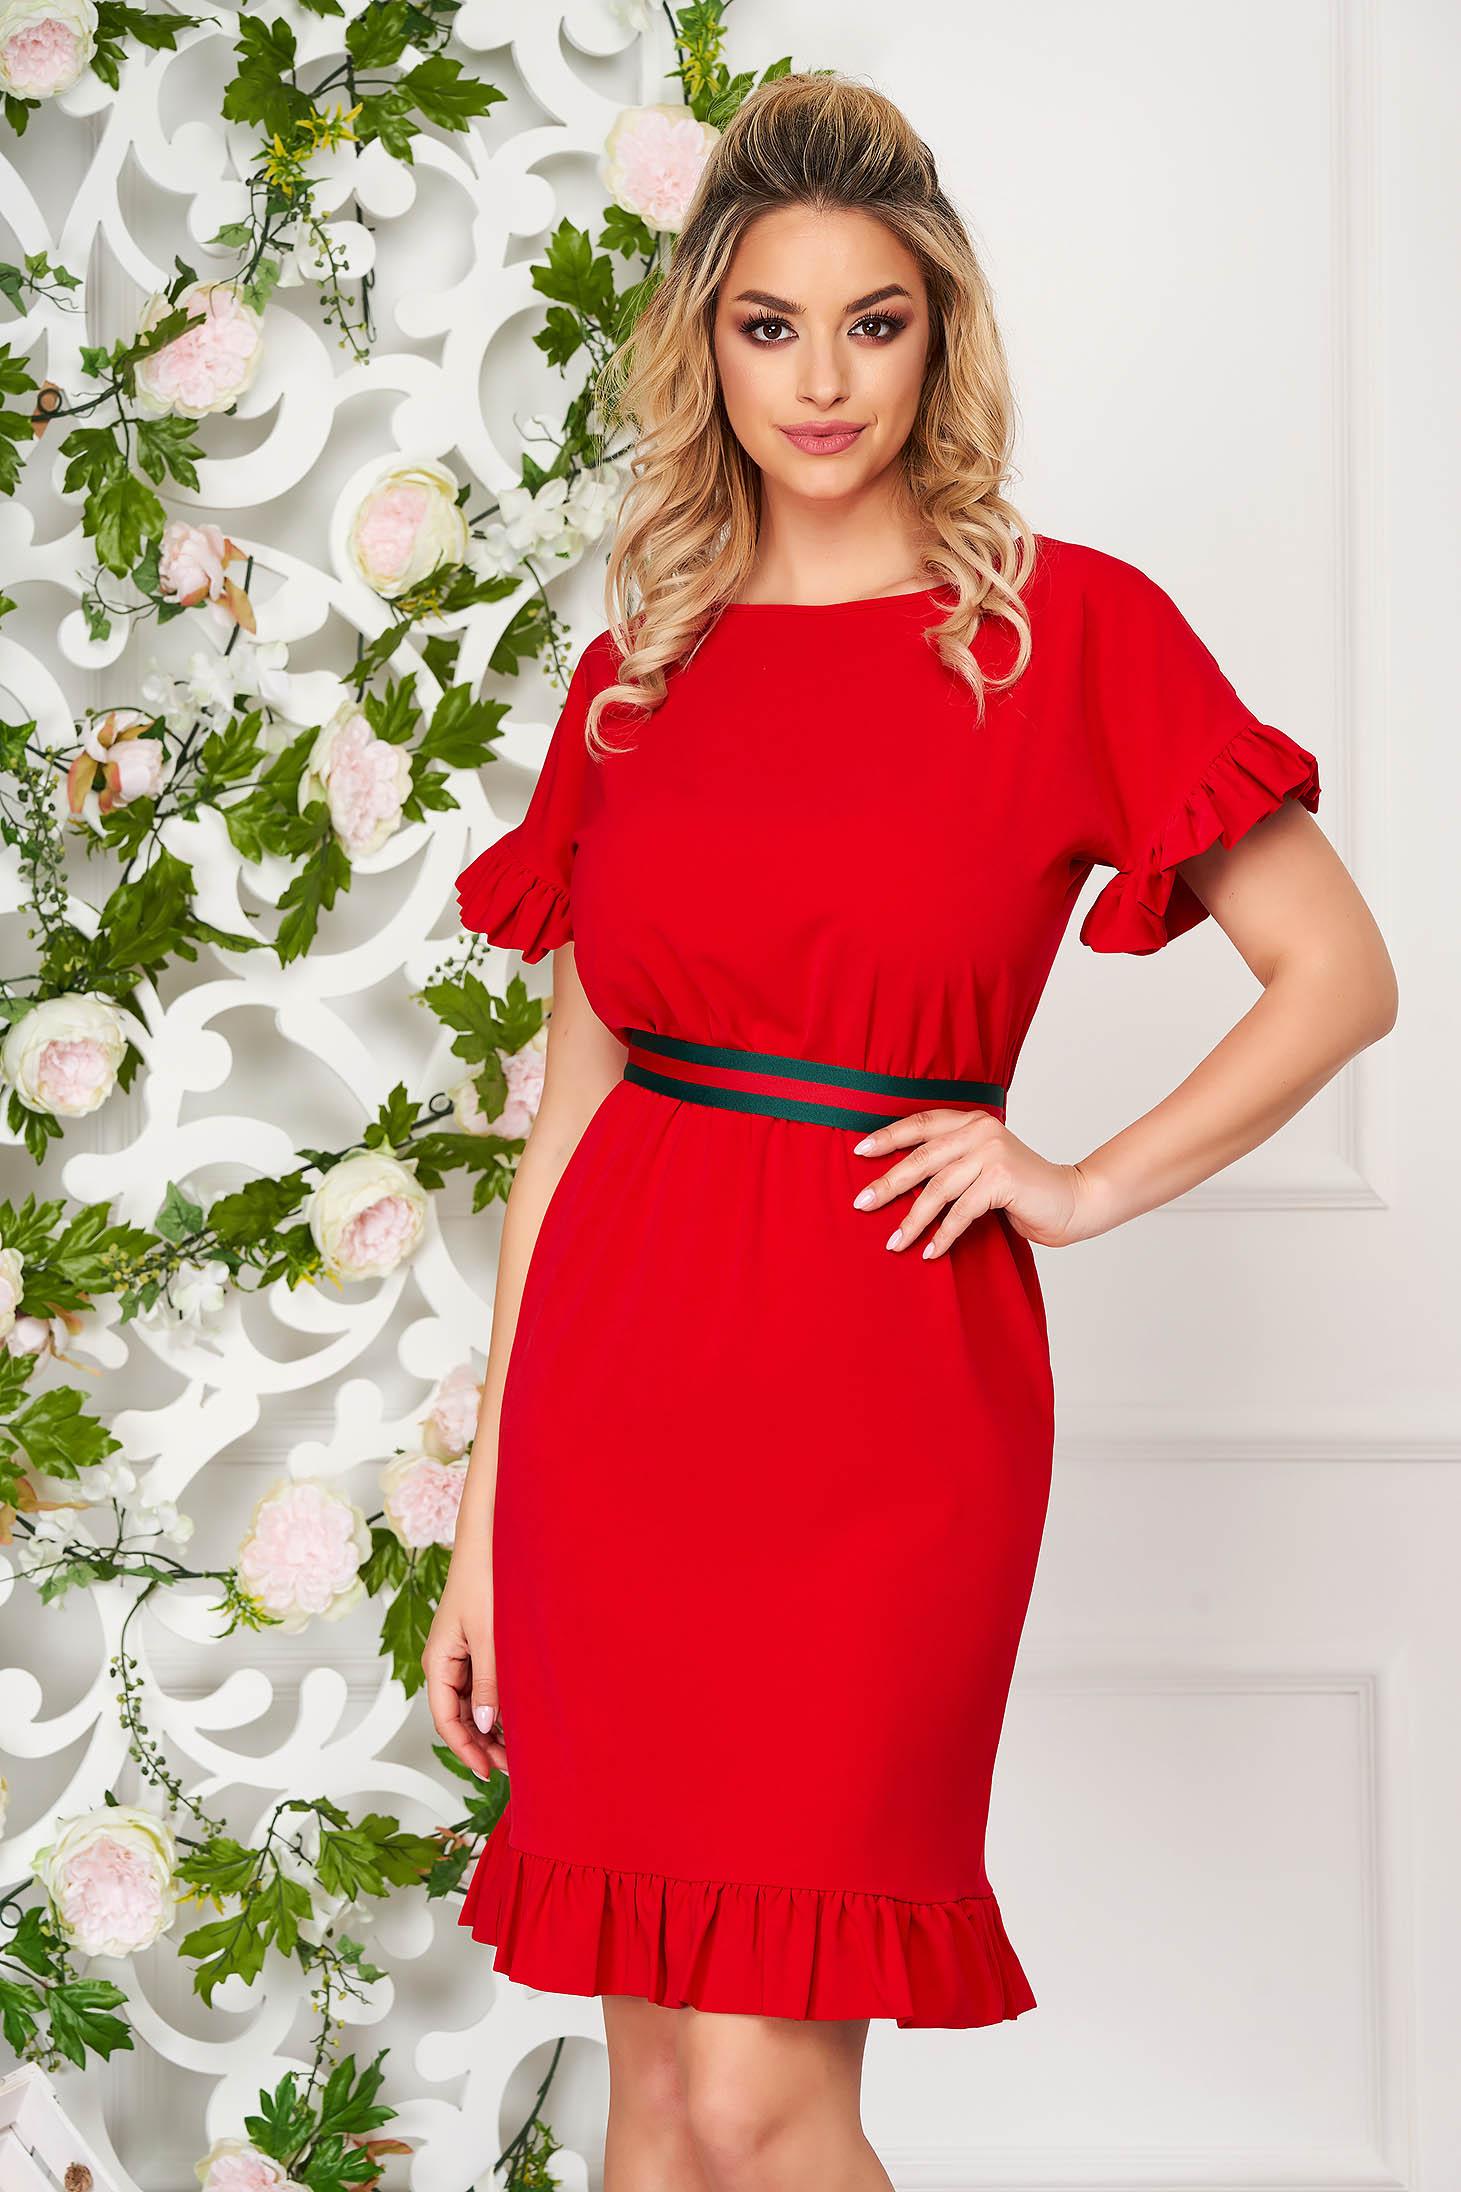 Rochie StarShinerS rosie eleganta scurta din stofa cu un croi drept si volanase la maneca